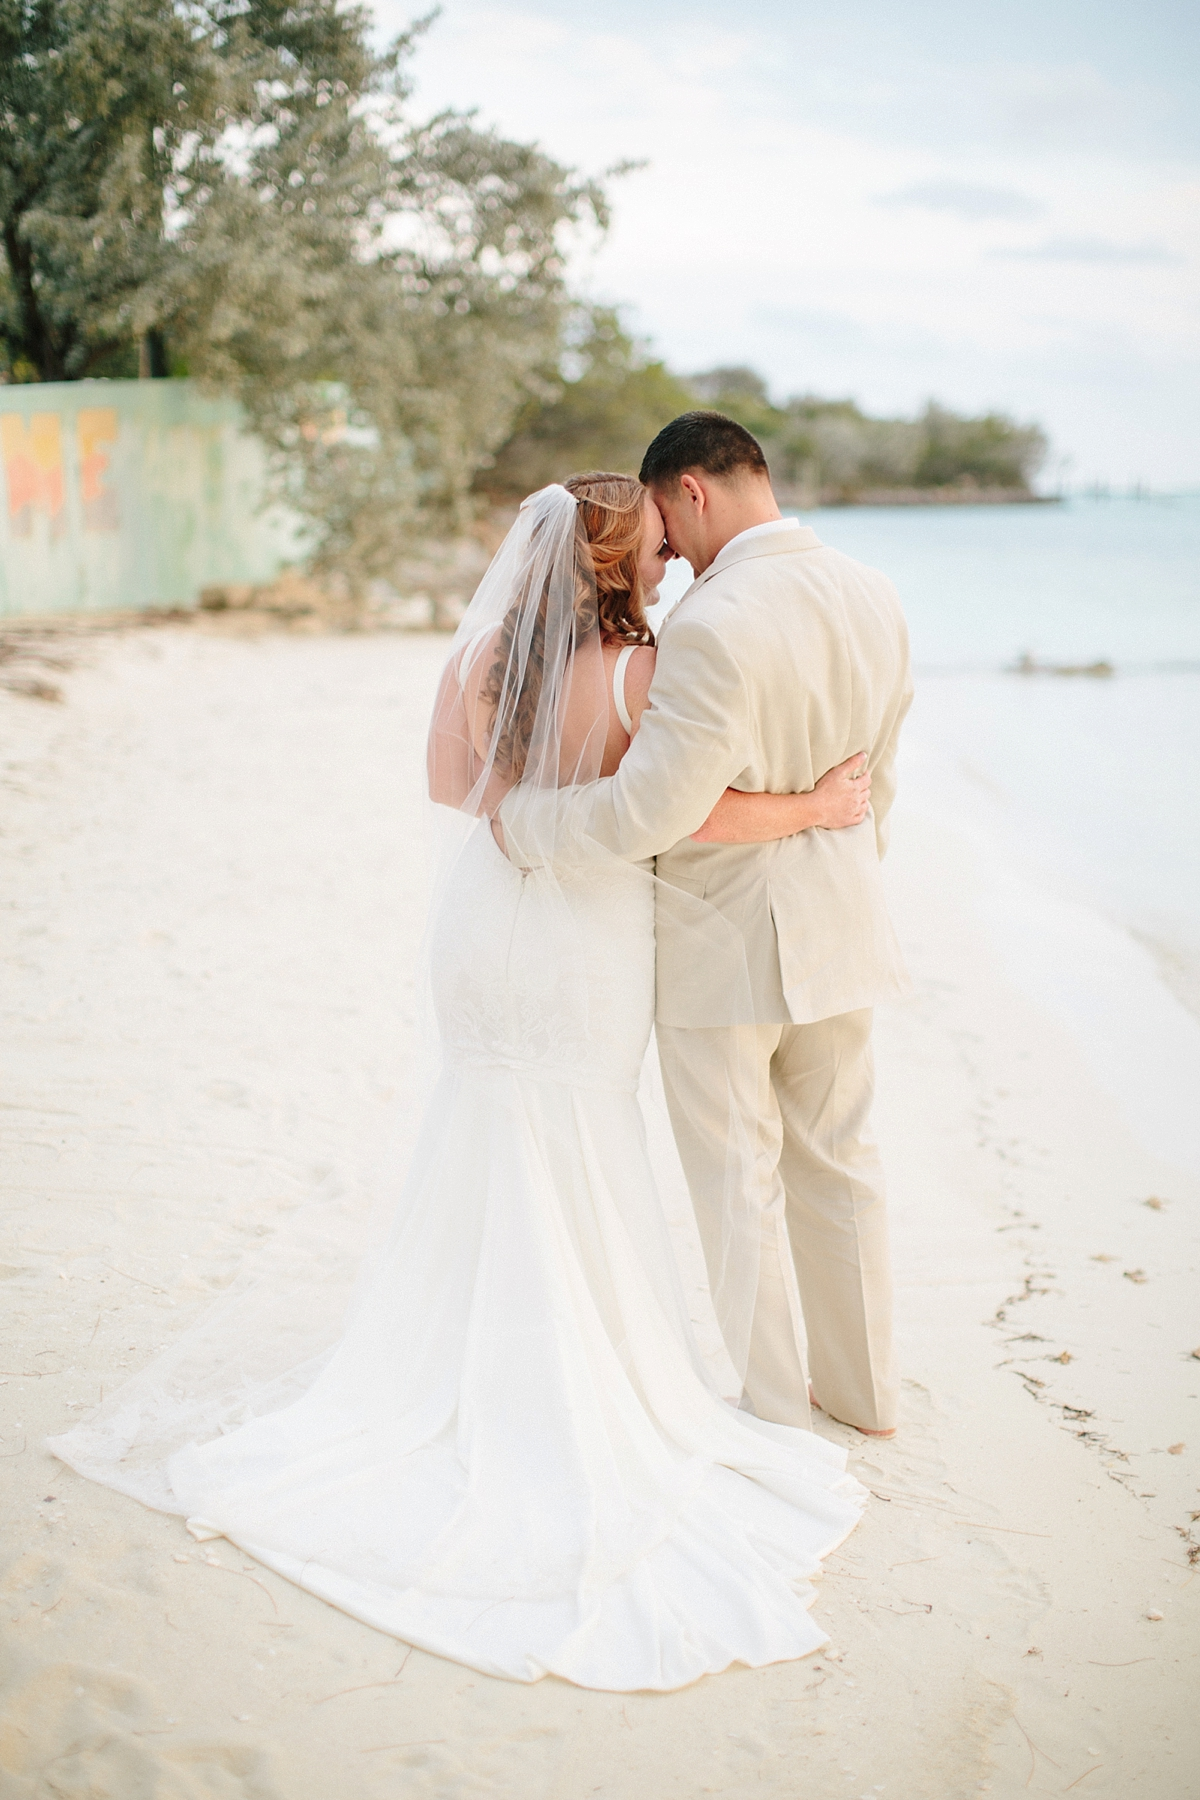 bahamas-destination-wedding-photographer-island-private-ceremony-staniel-cay_0034.jpg